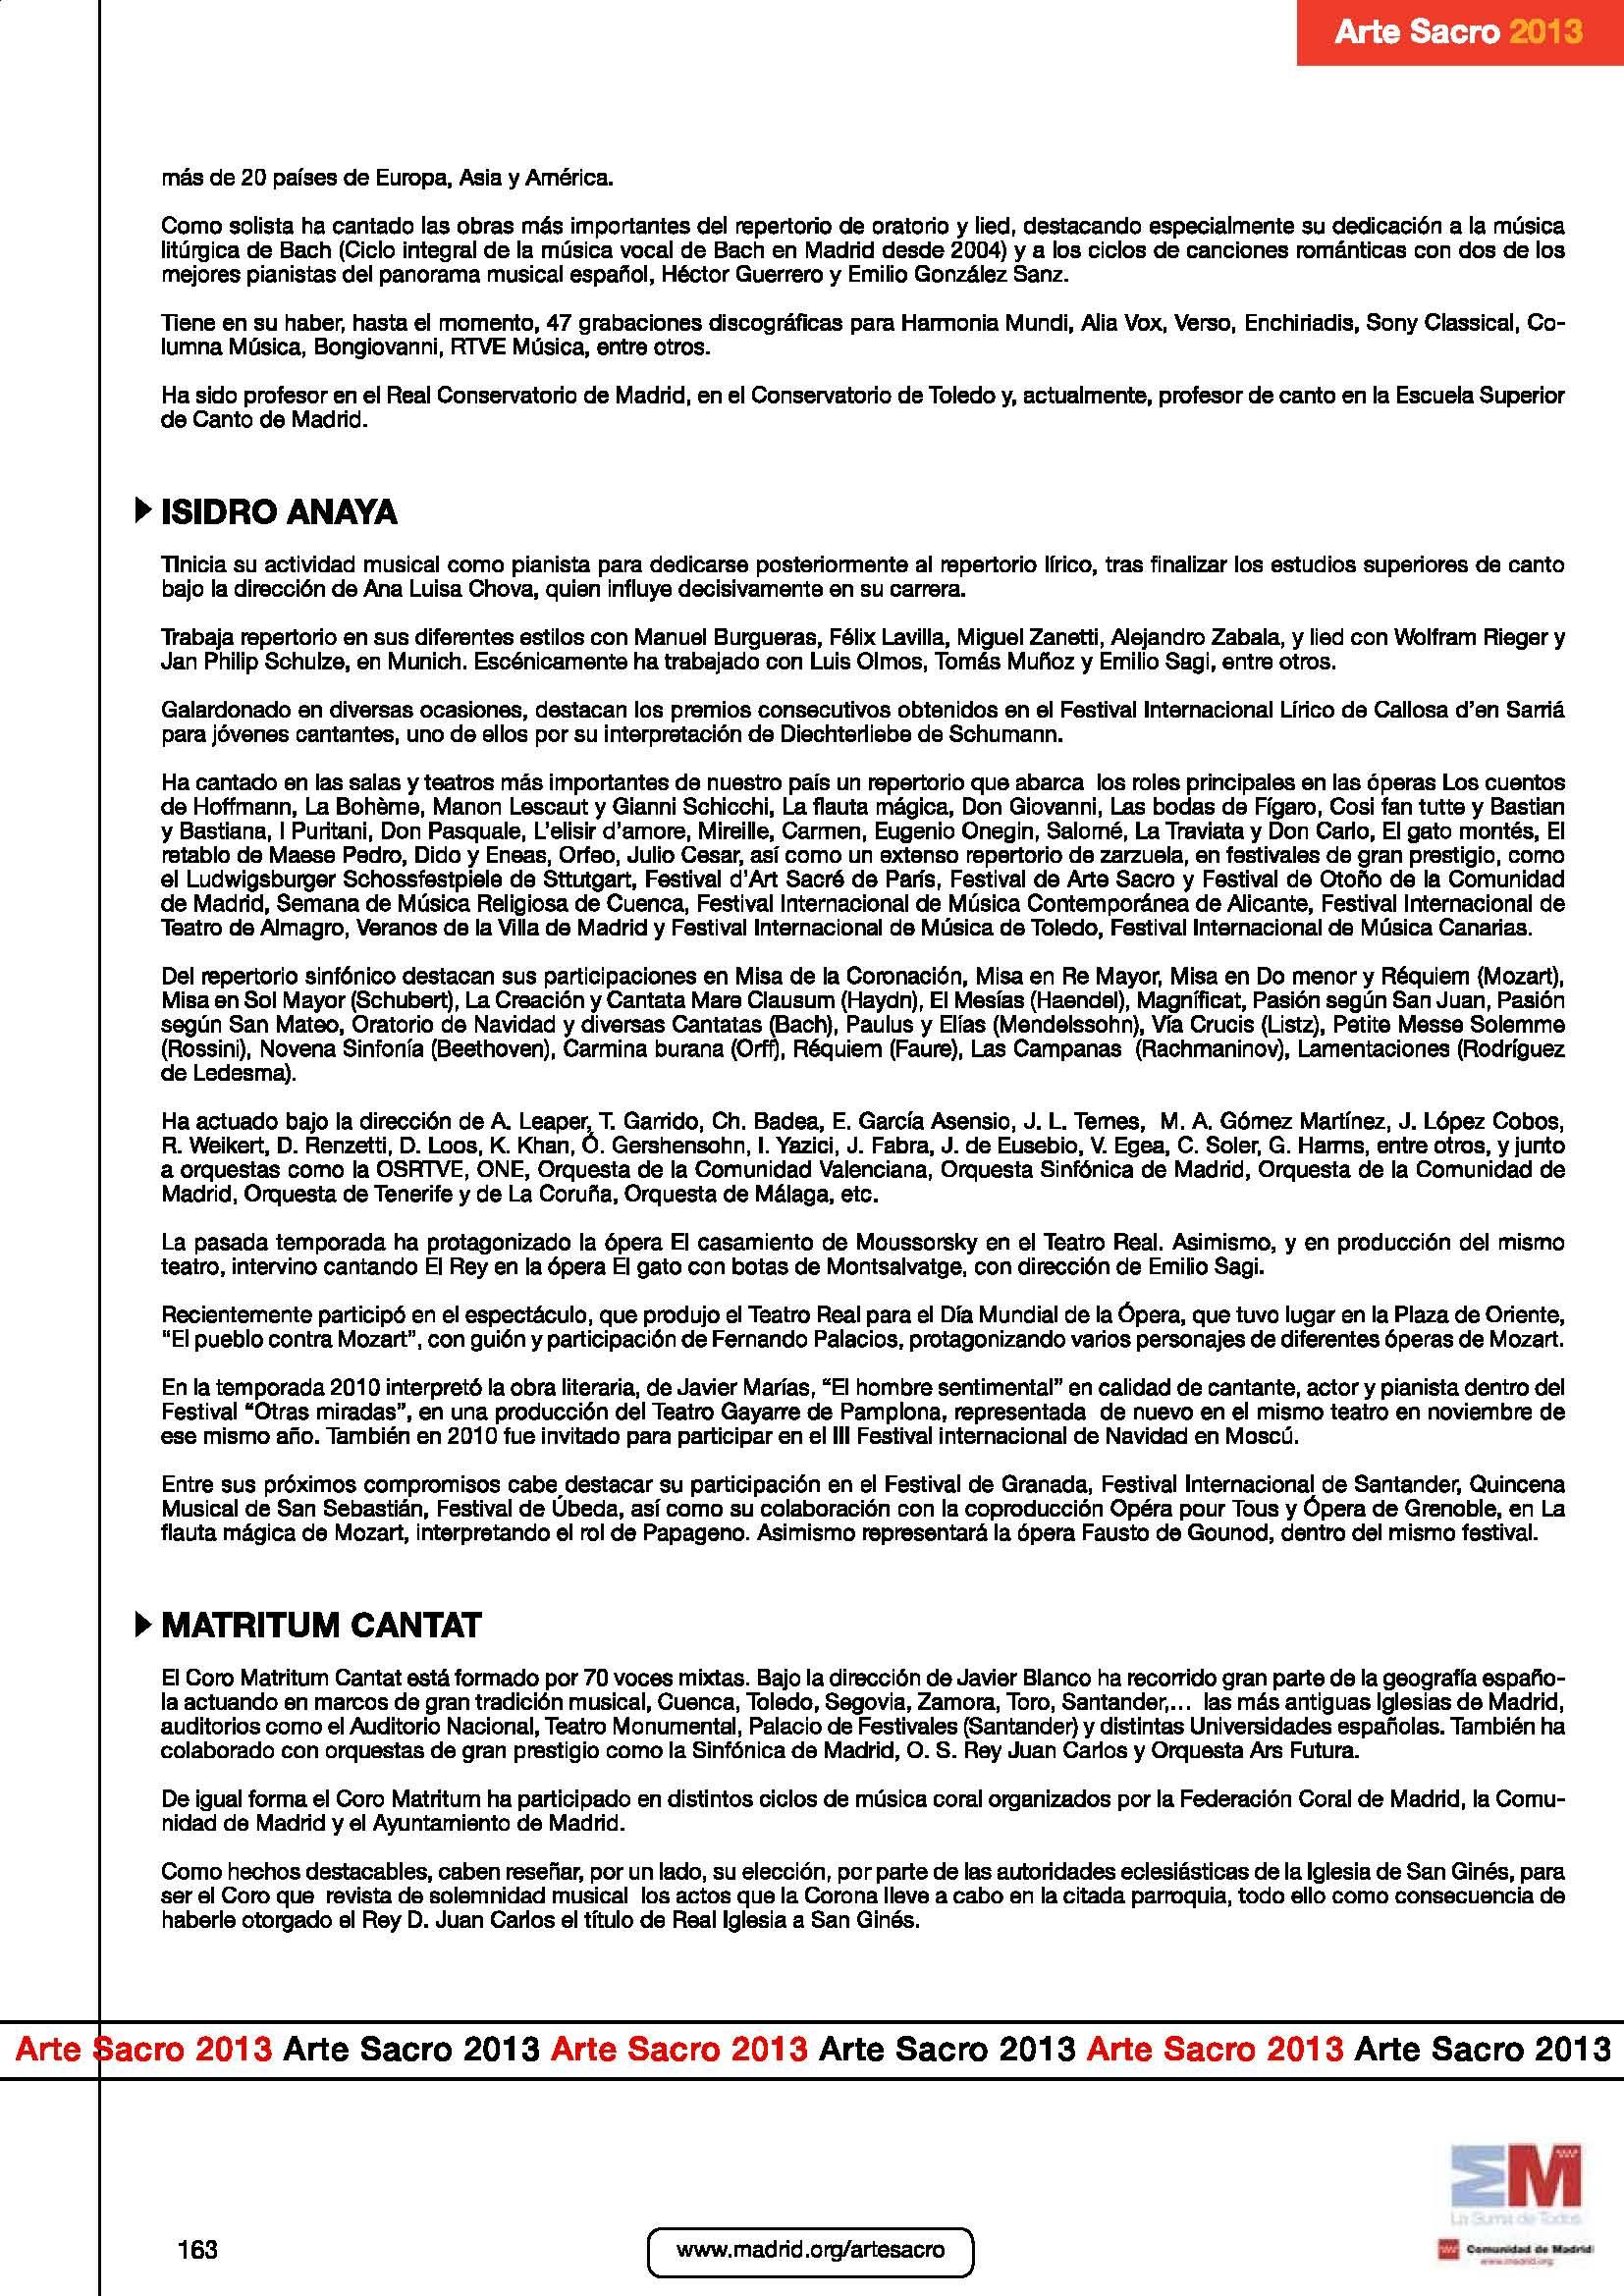 dossier_completo_Página_163